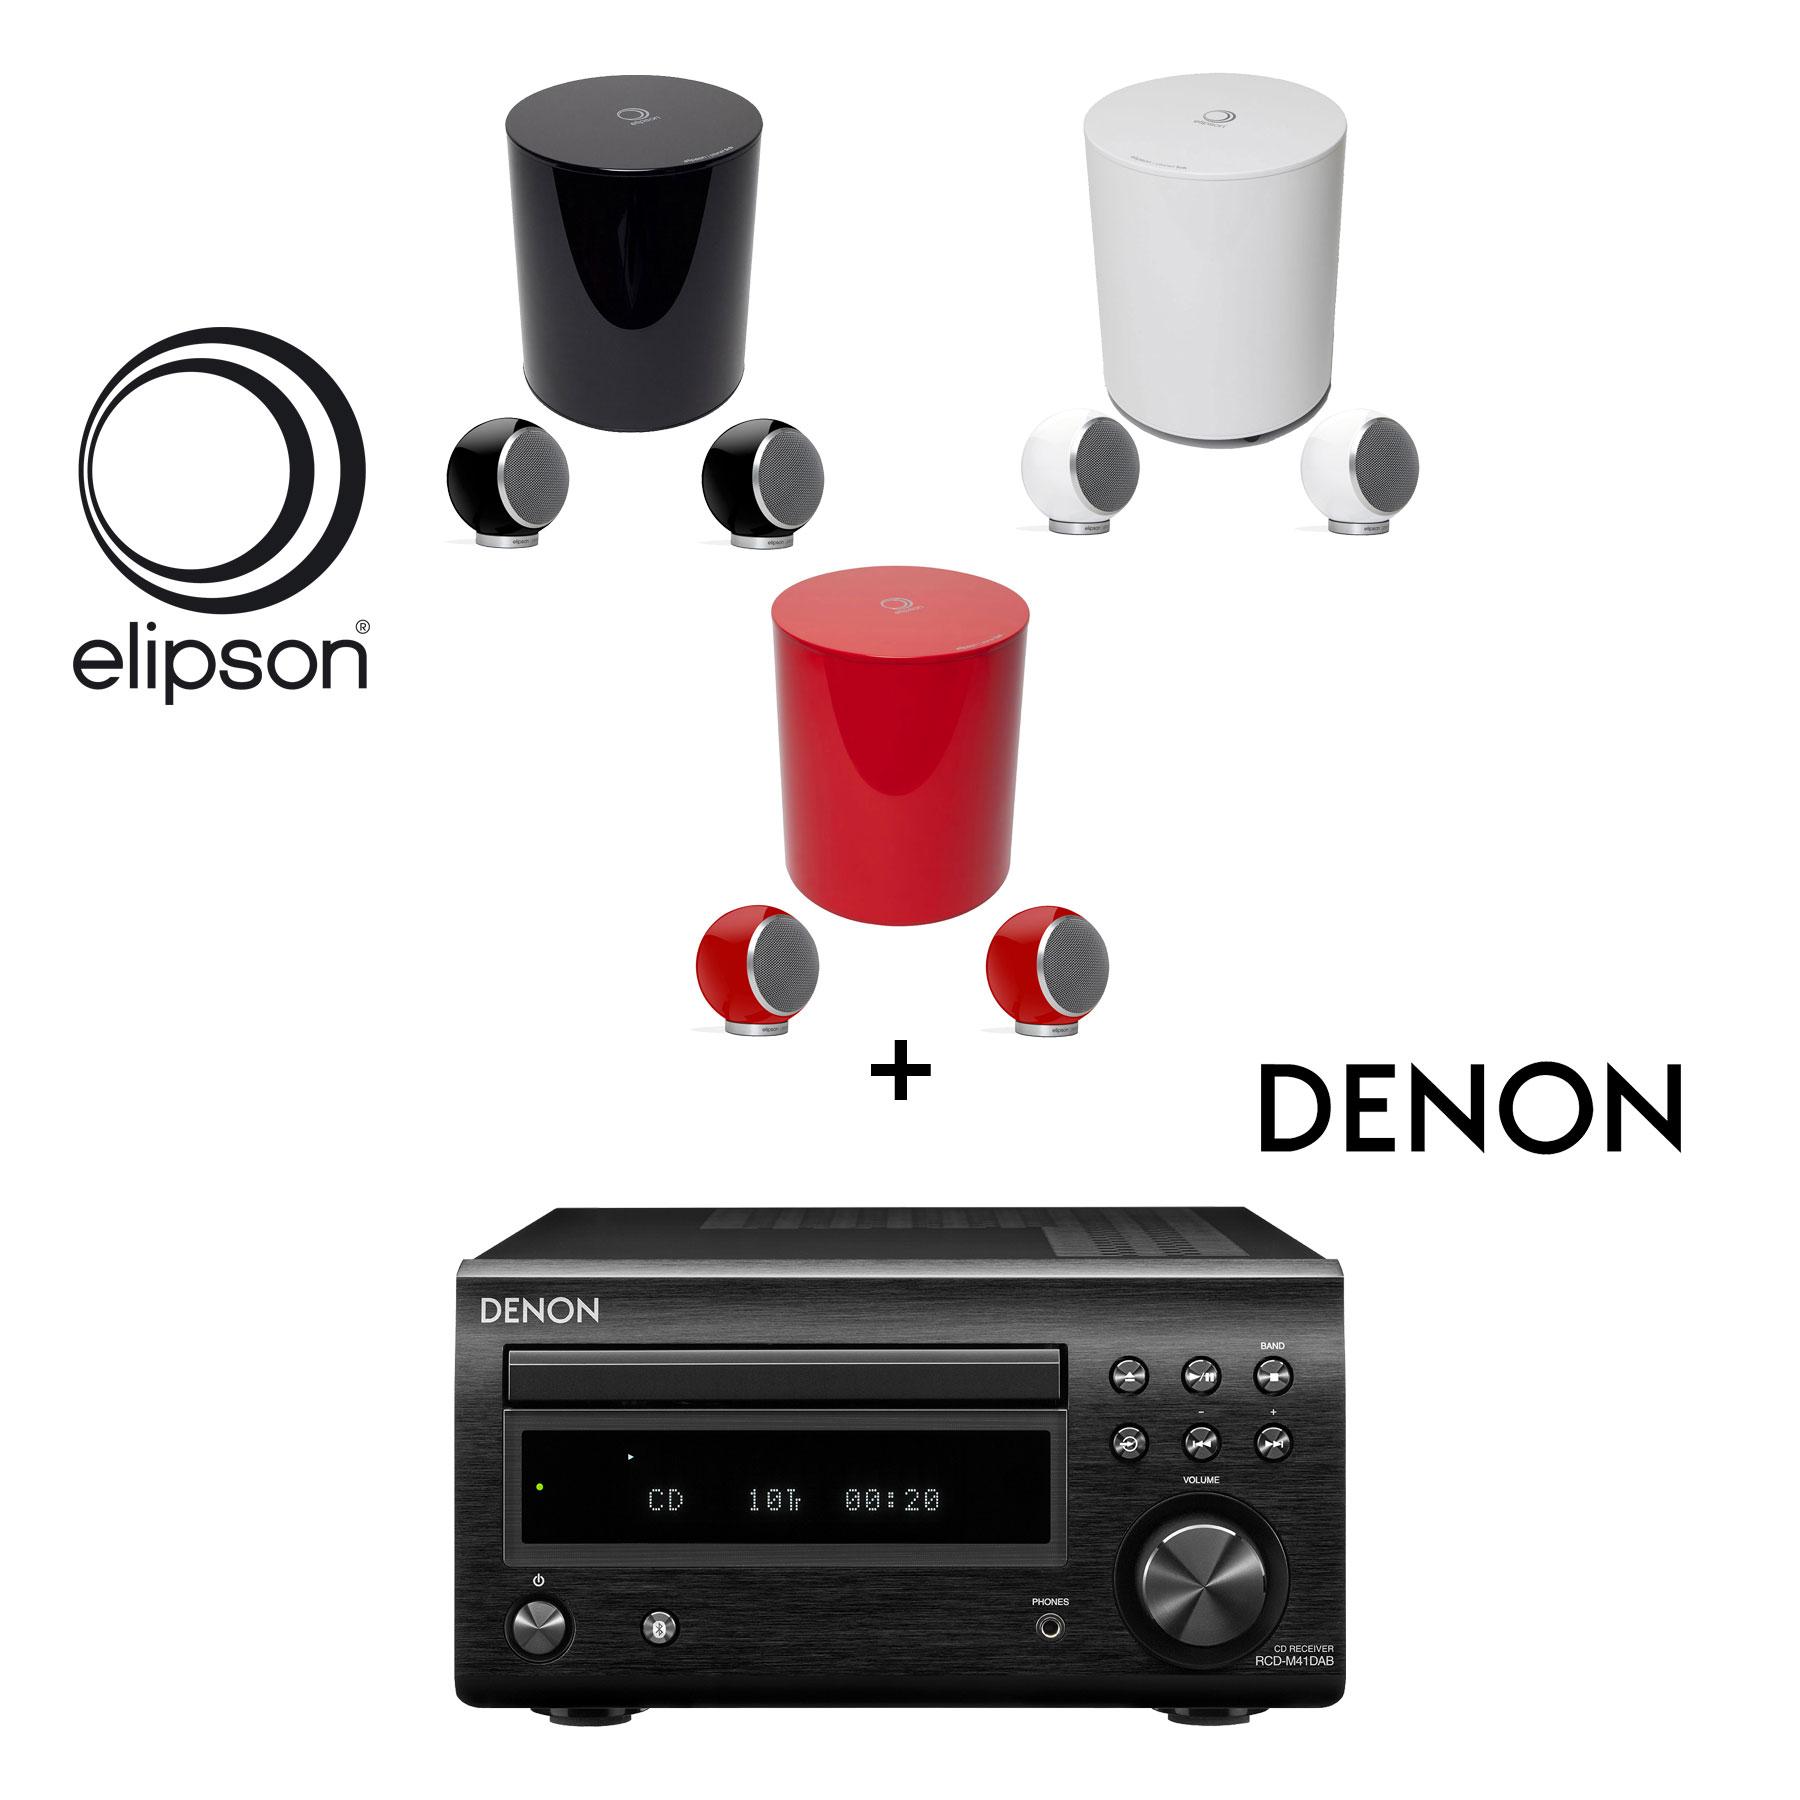 Denon RCD-M 41 DAB schwarz CD-Receiver + Elipson Planet M 2.1 Lautsprecher-Set 99480